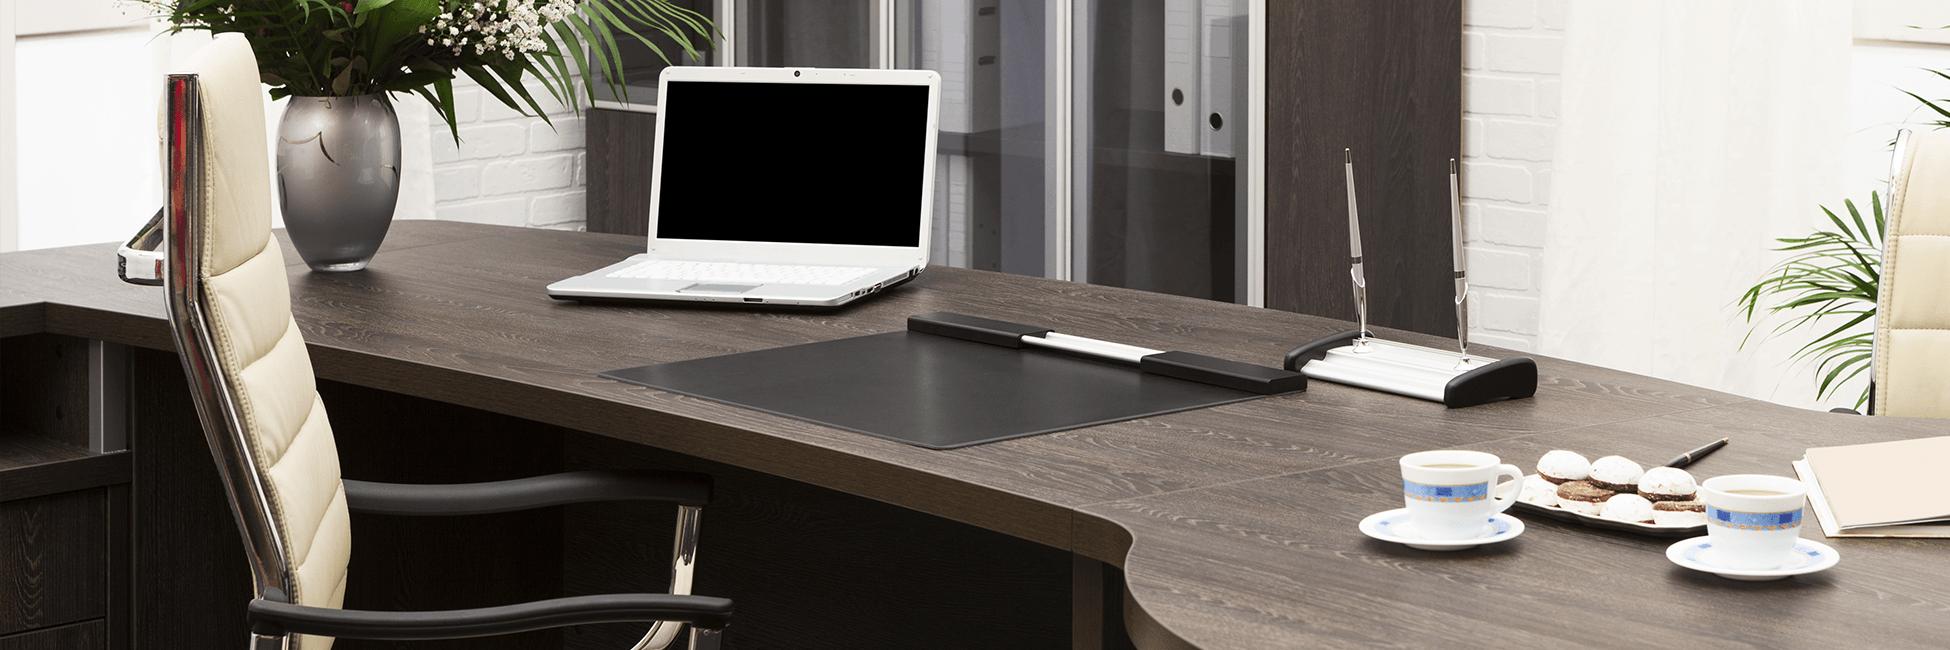 Oficinas y tabiques for Mobiliario modular para oficina